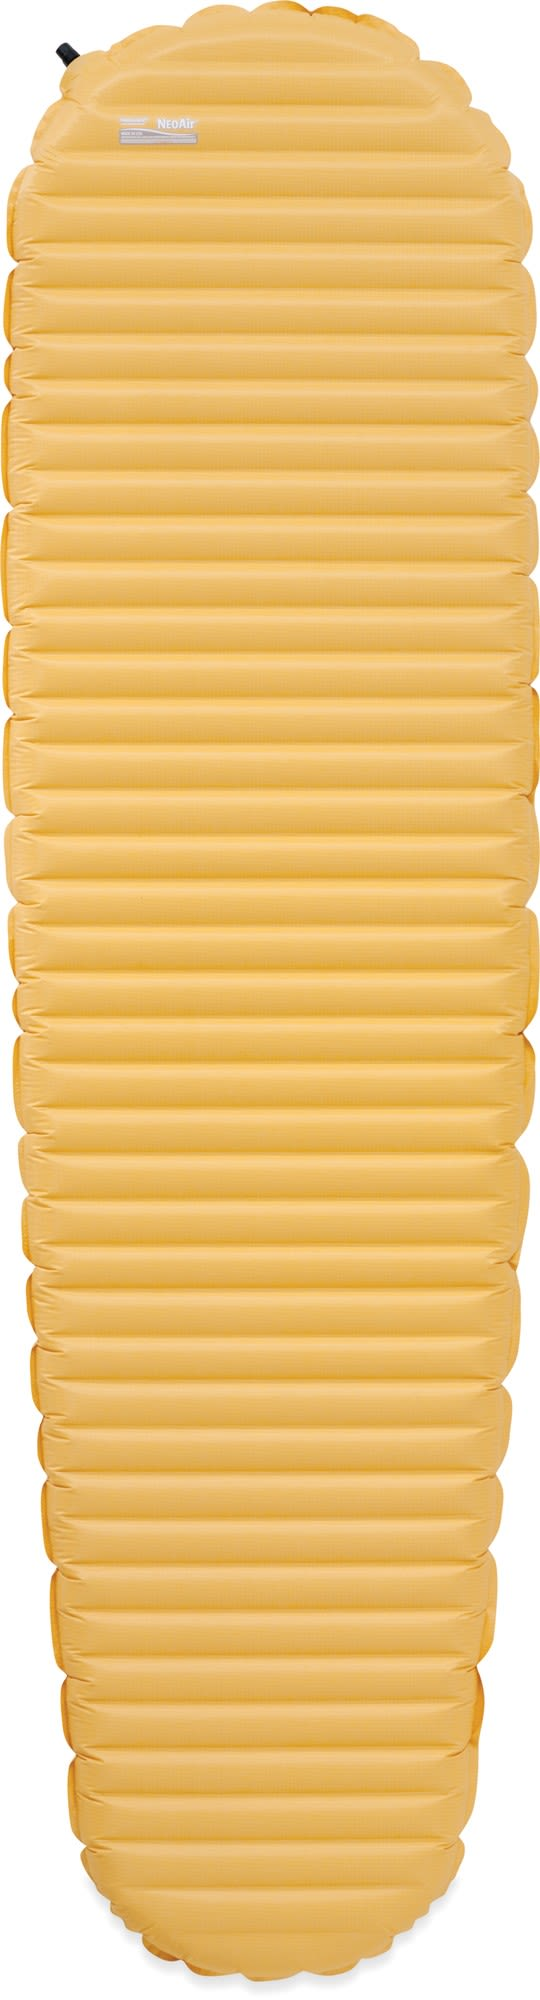 Therm-a-Rest Neoair Xlite Small Gelb, Daunen 119 cm -Farbe Marigold, 119 cm